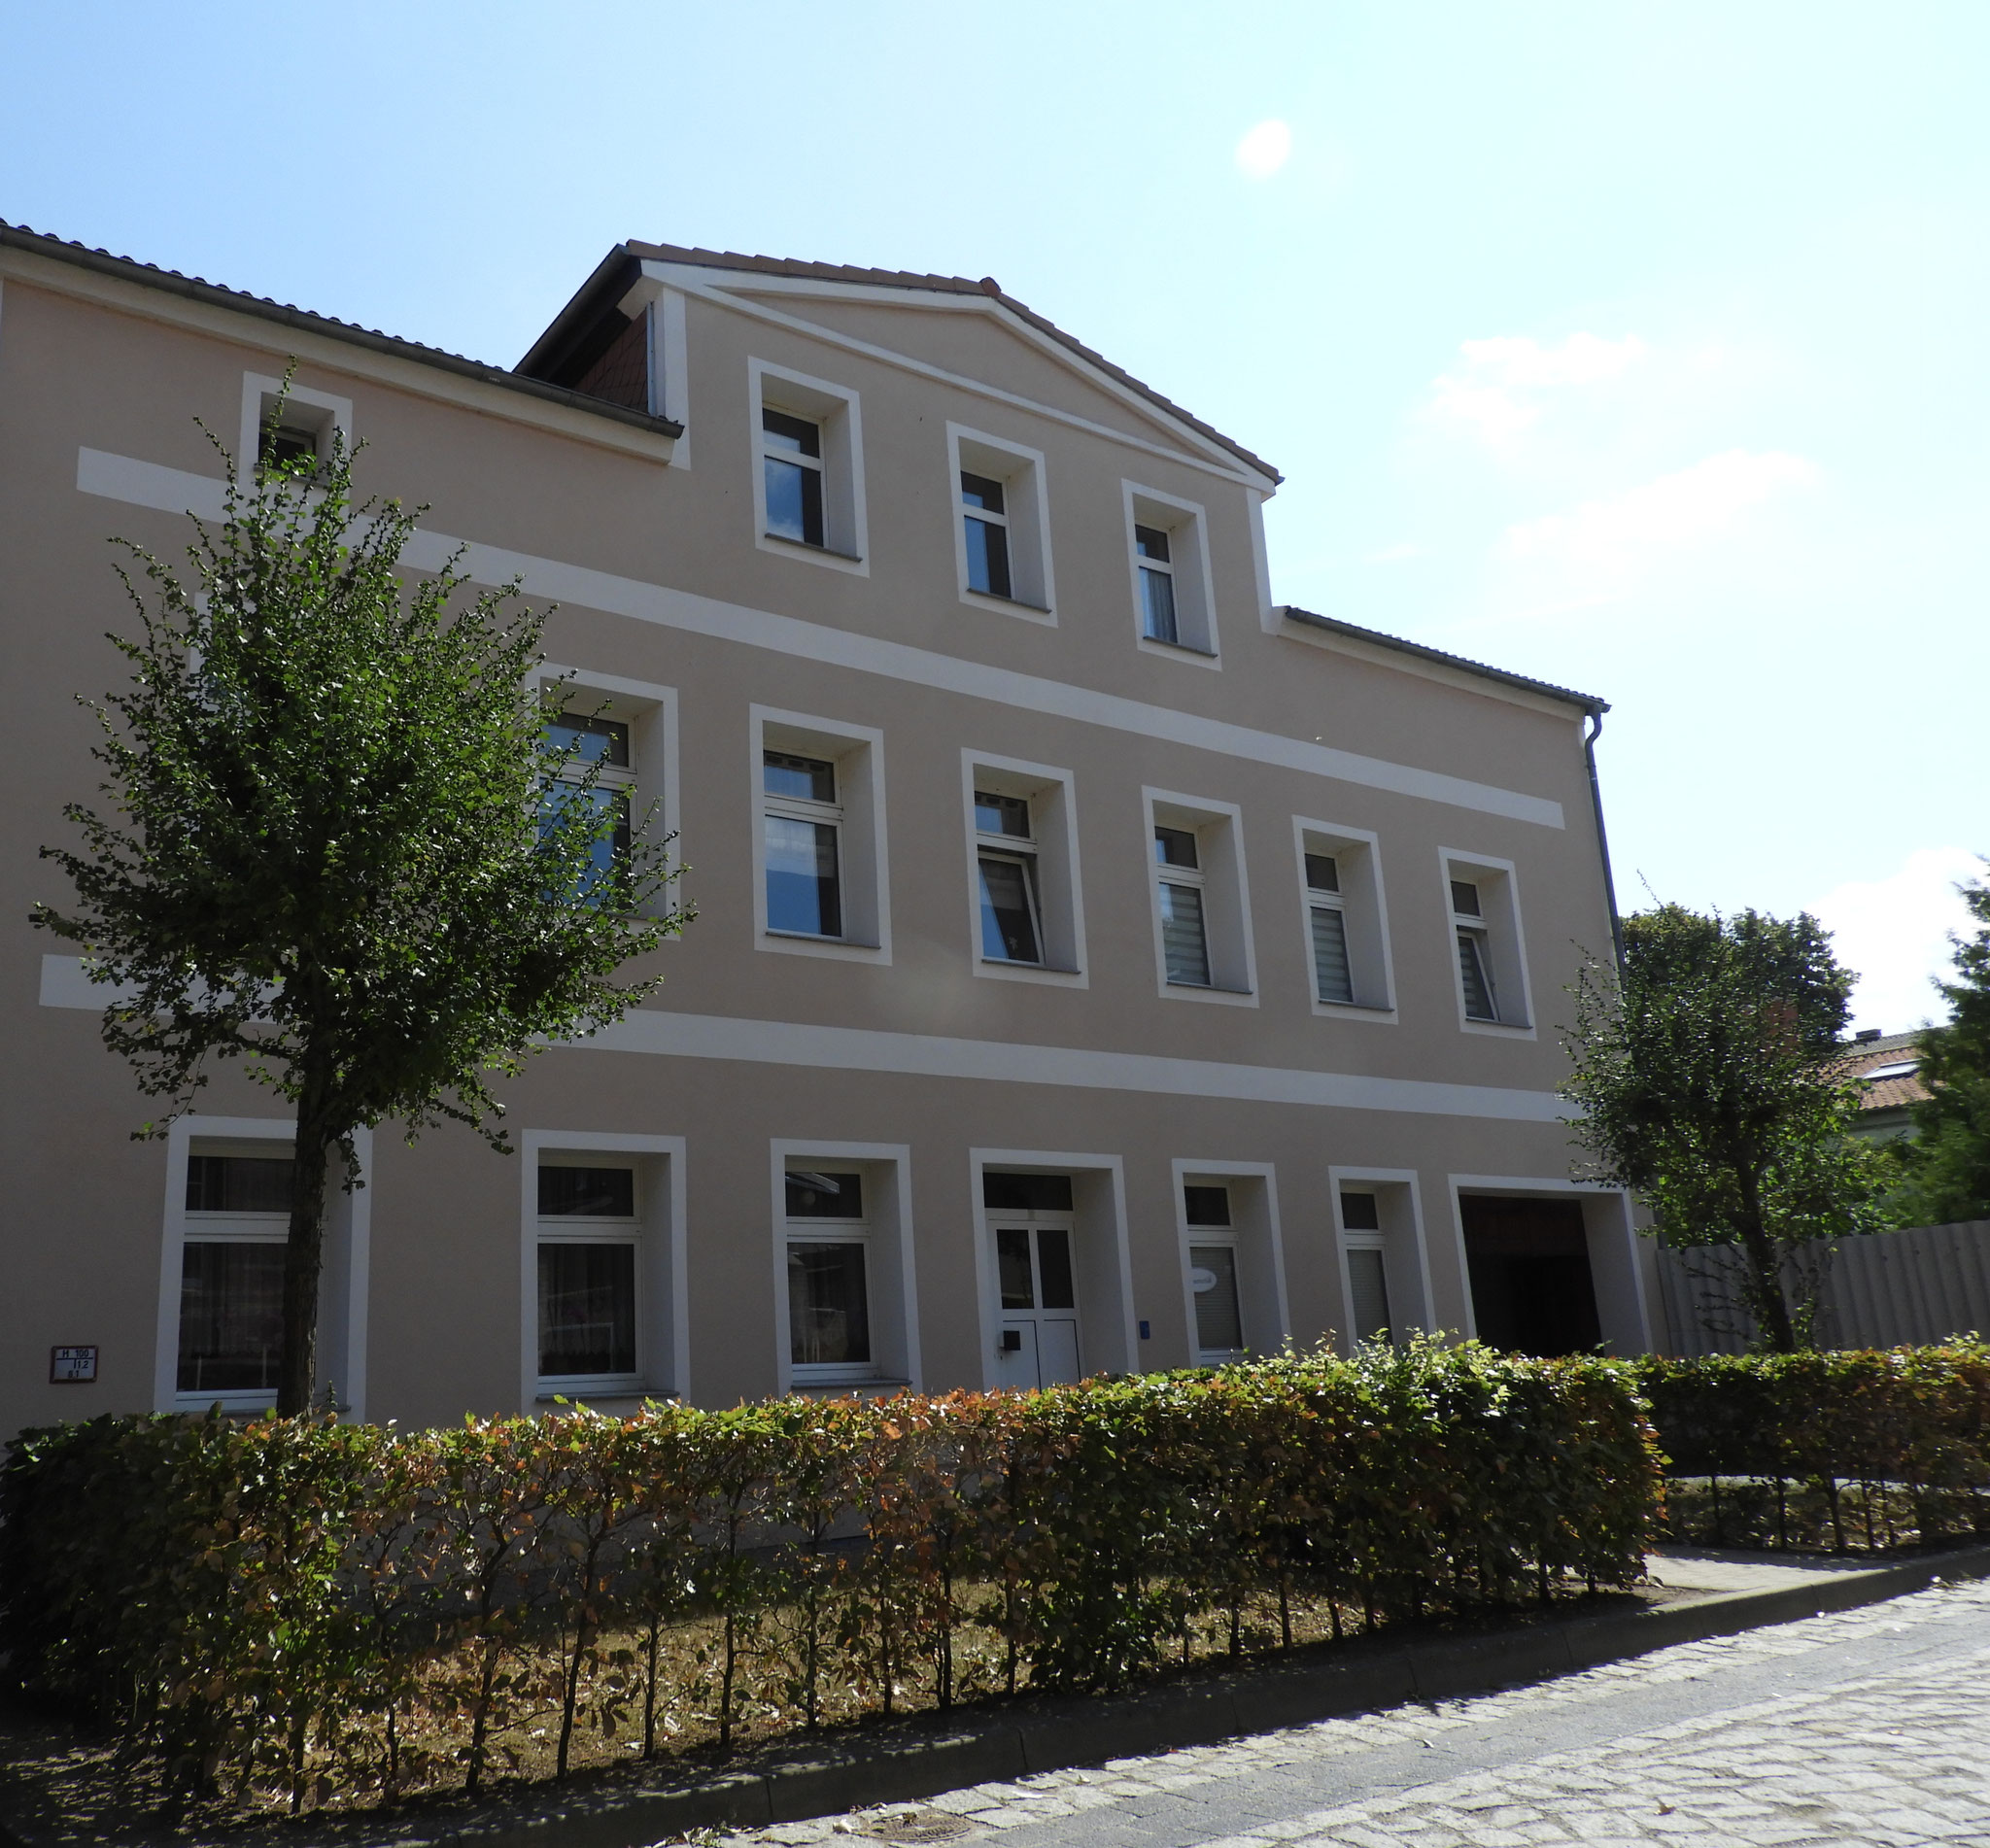 MFH in Altentreptow